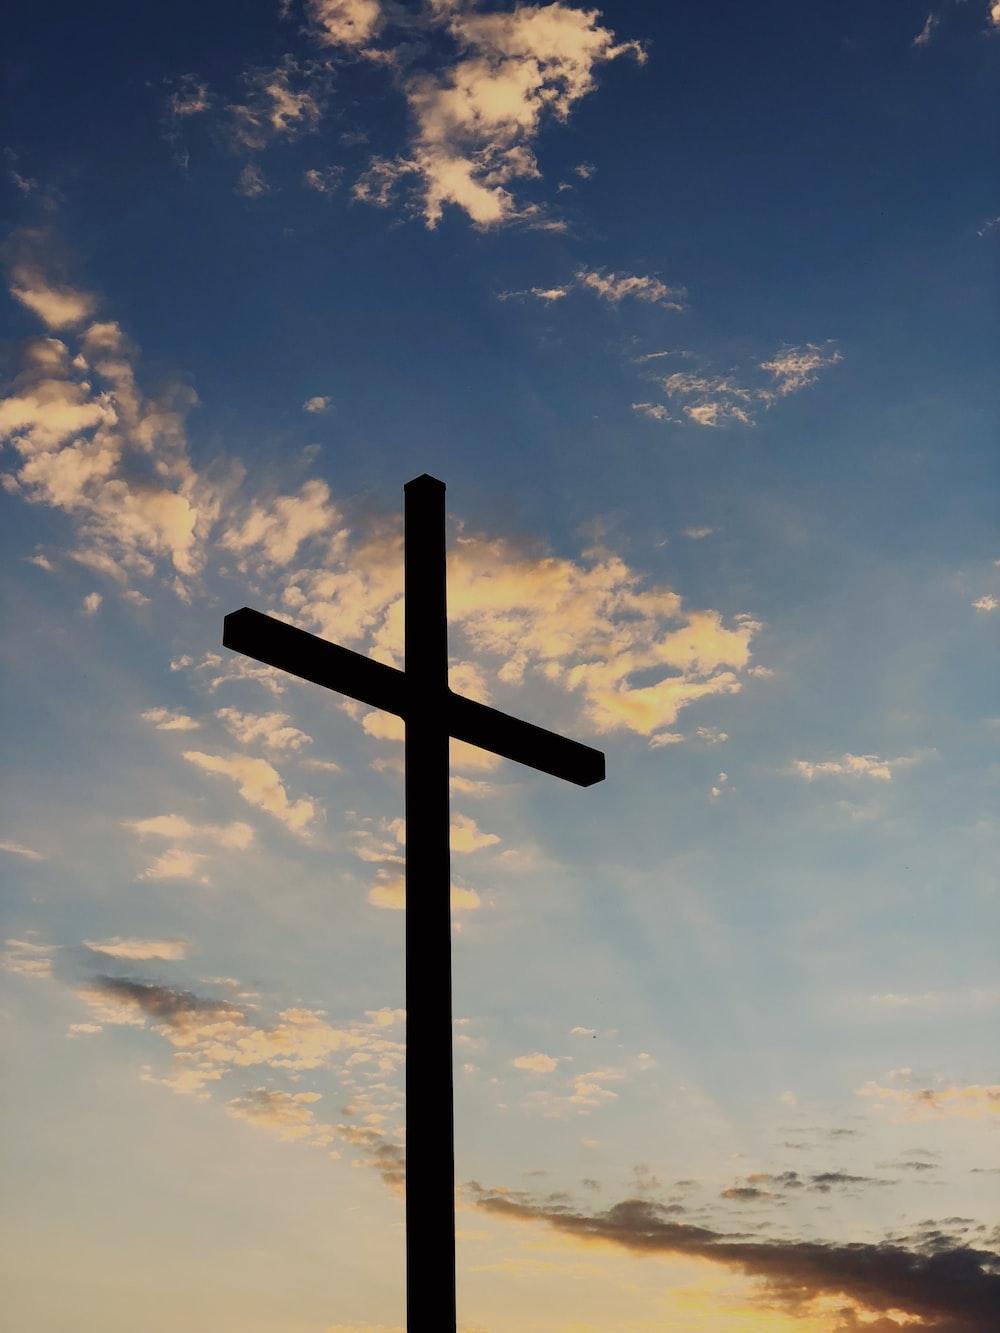 silhouette of cross under blue sky